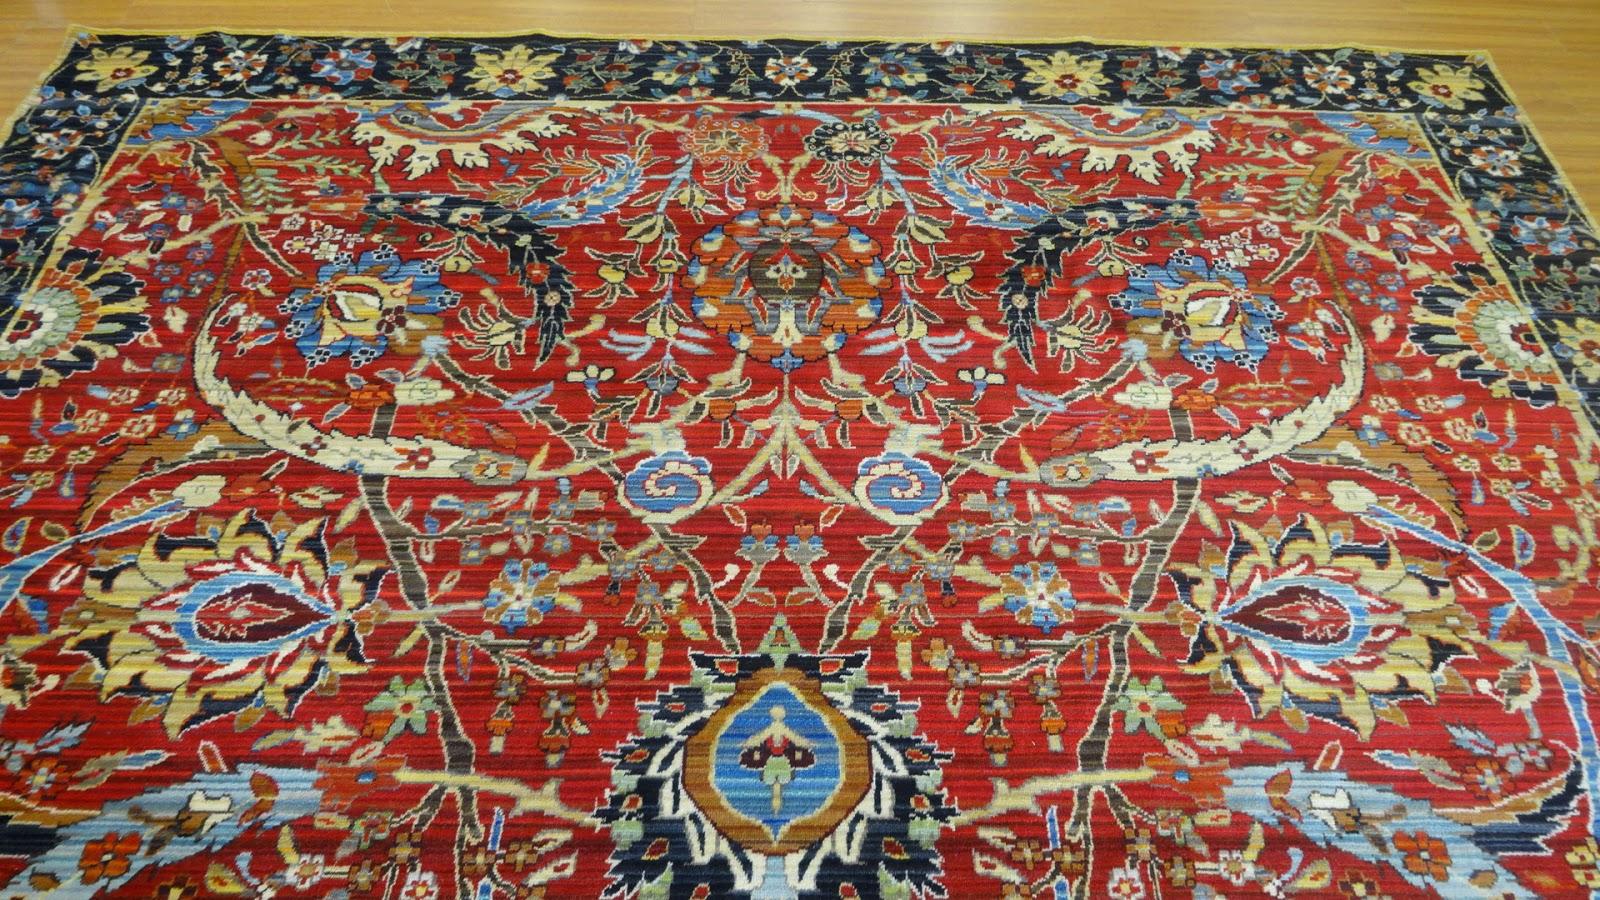 Most Expensive Carpets In The World - Carpet Vidalondon